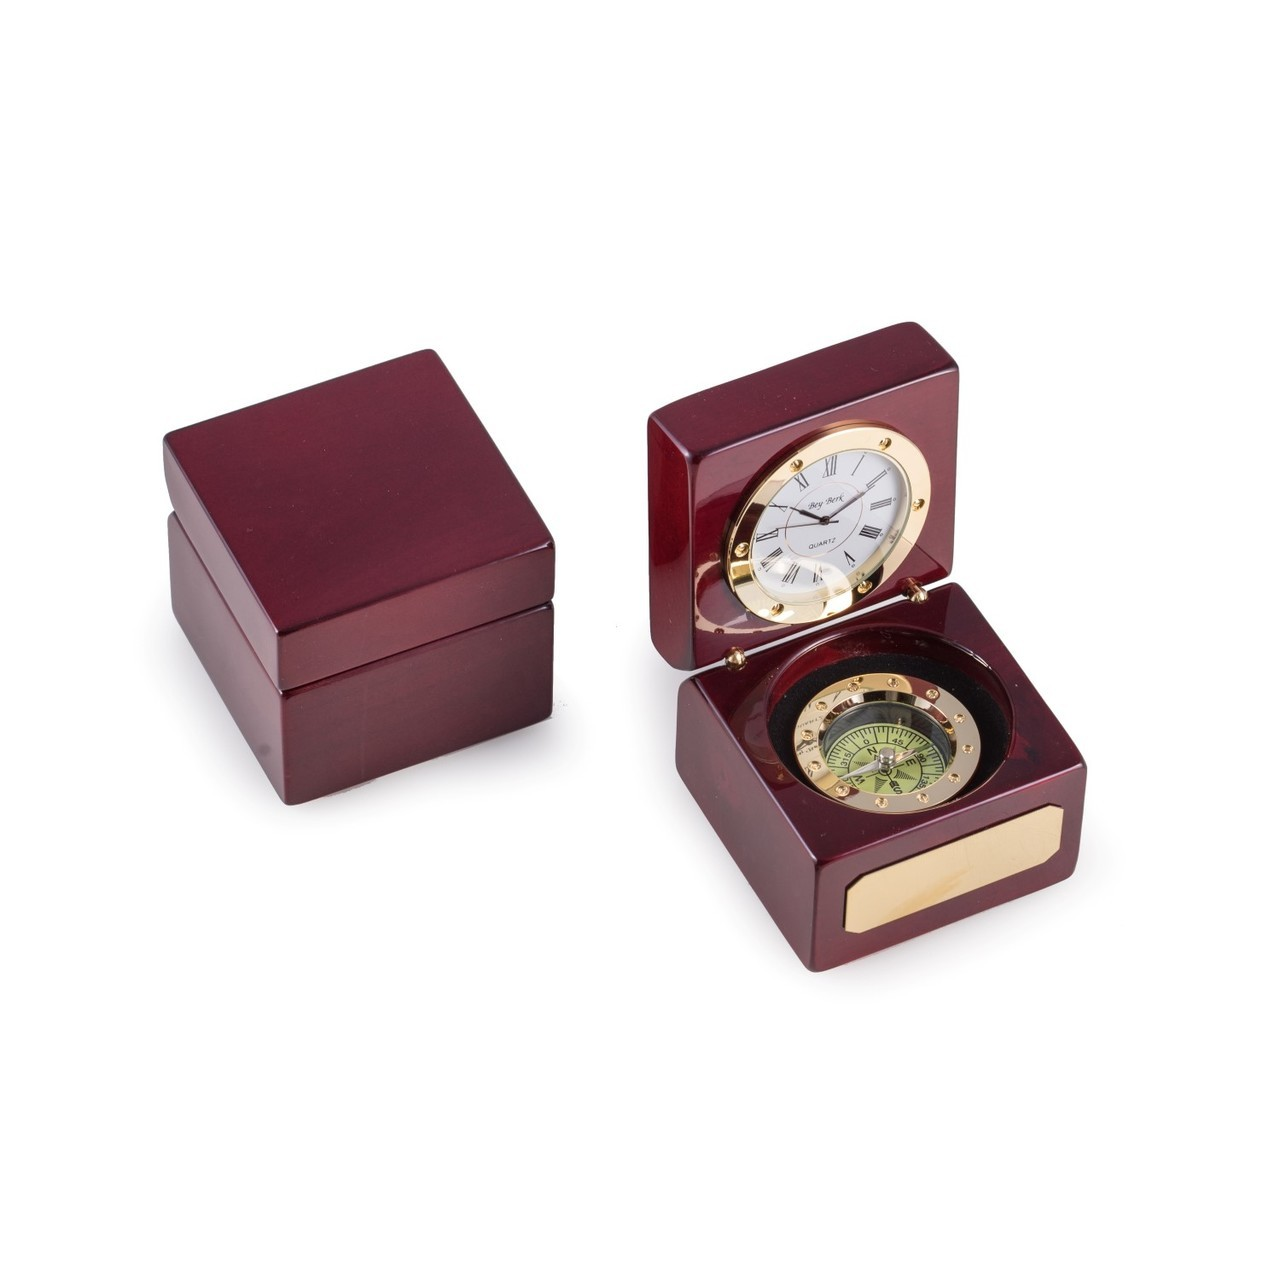 Navigator Clock with Compass